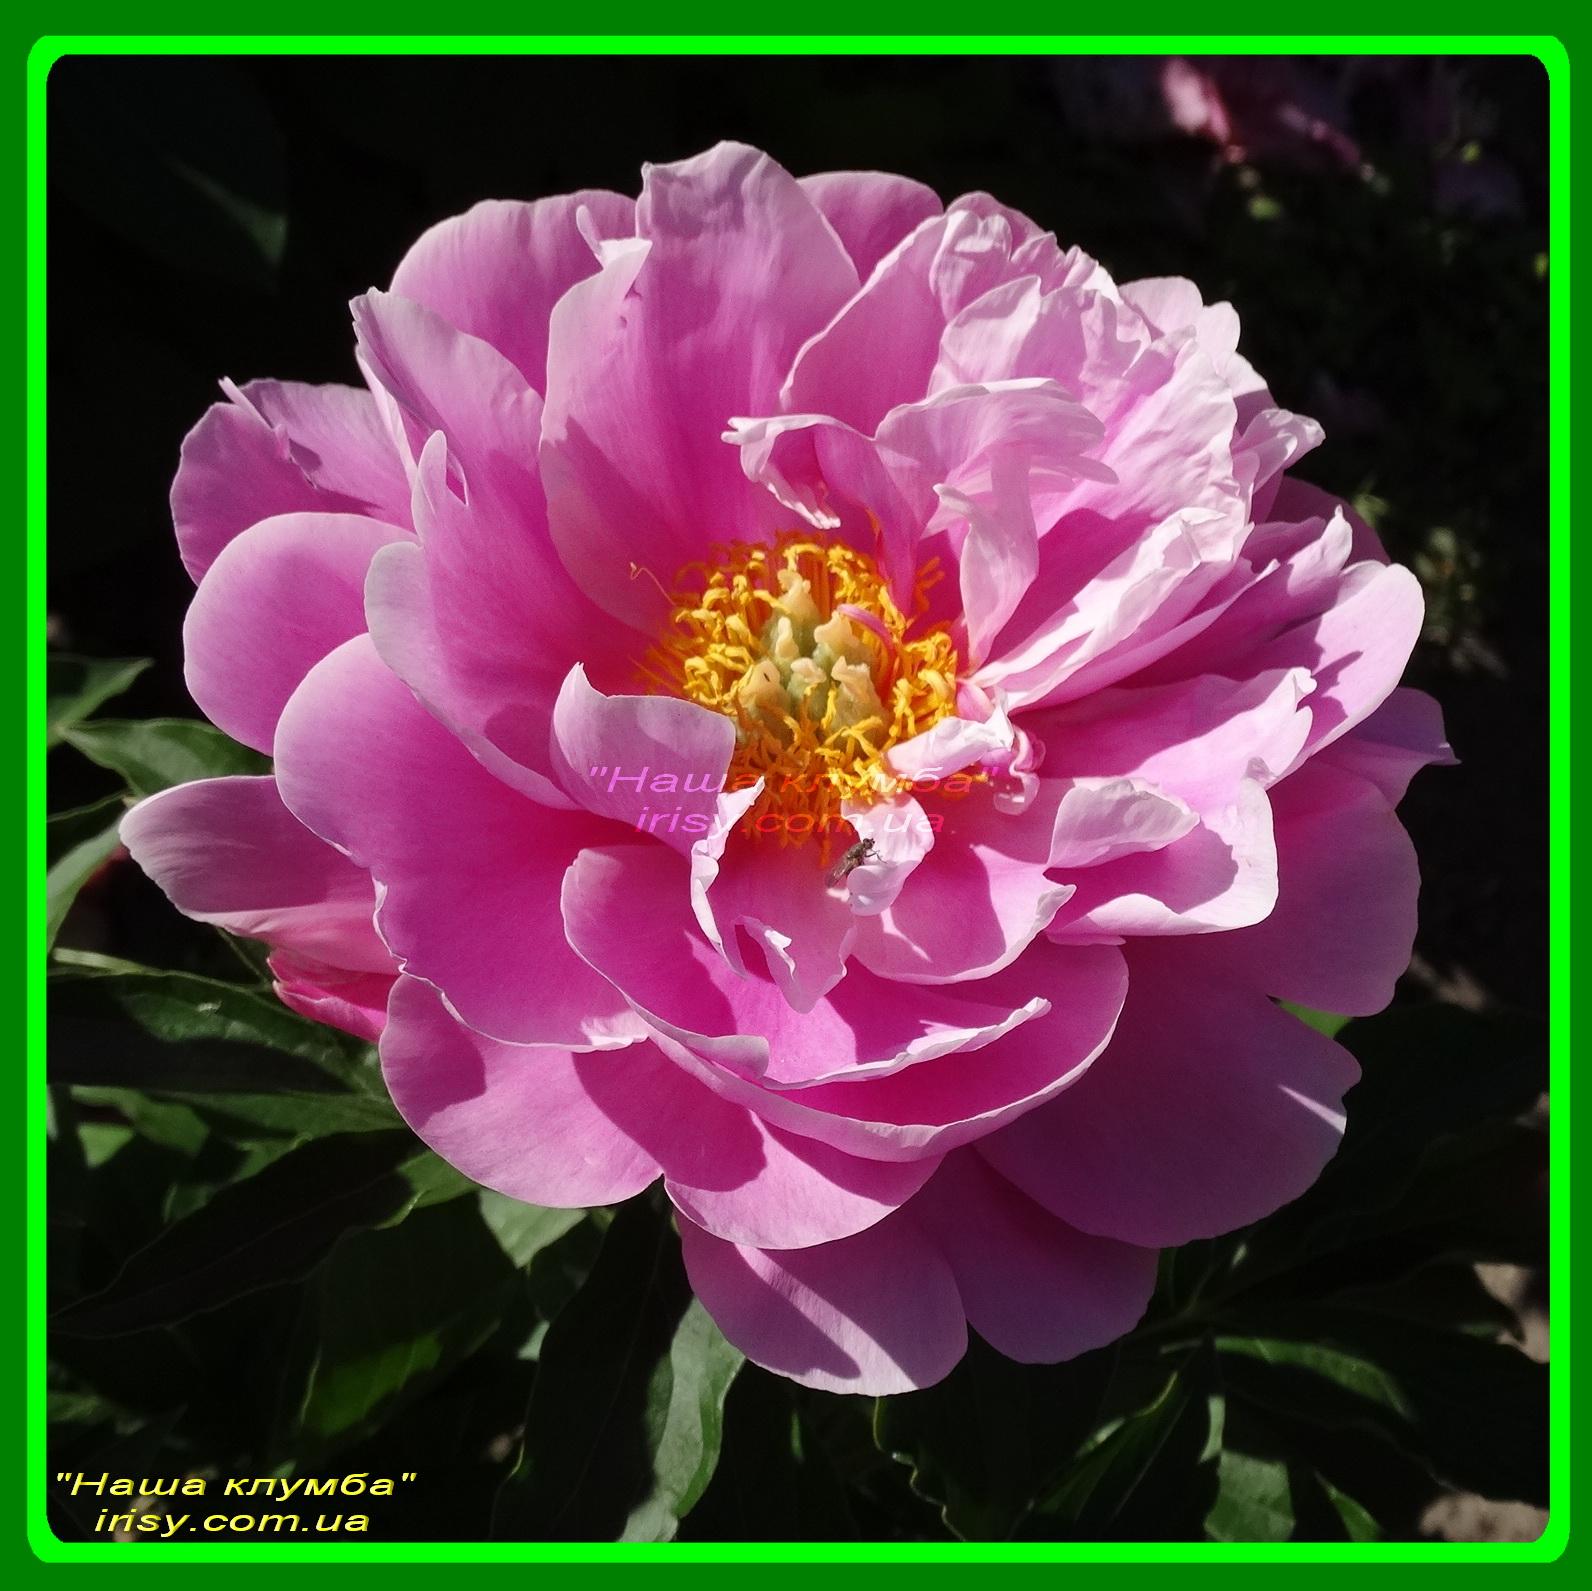 Silver Rose. Klehm'2003, USА.